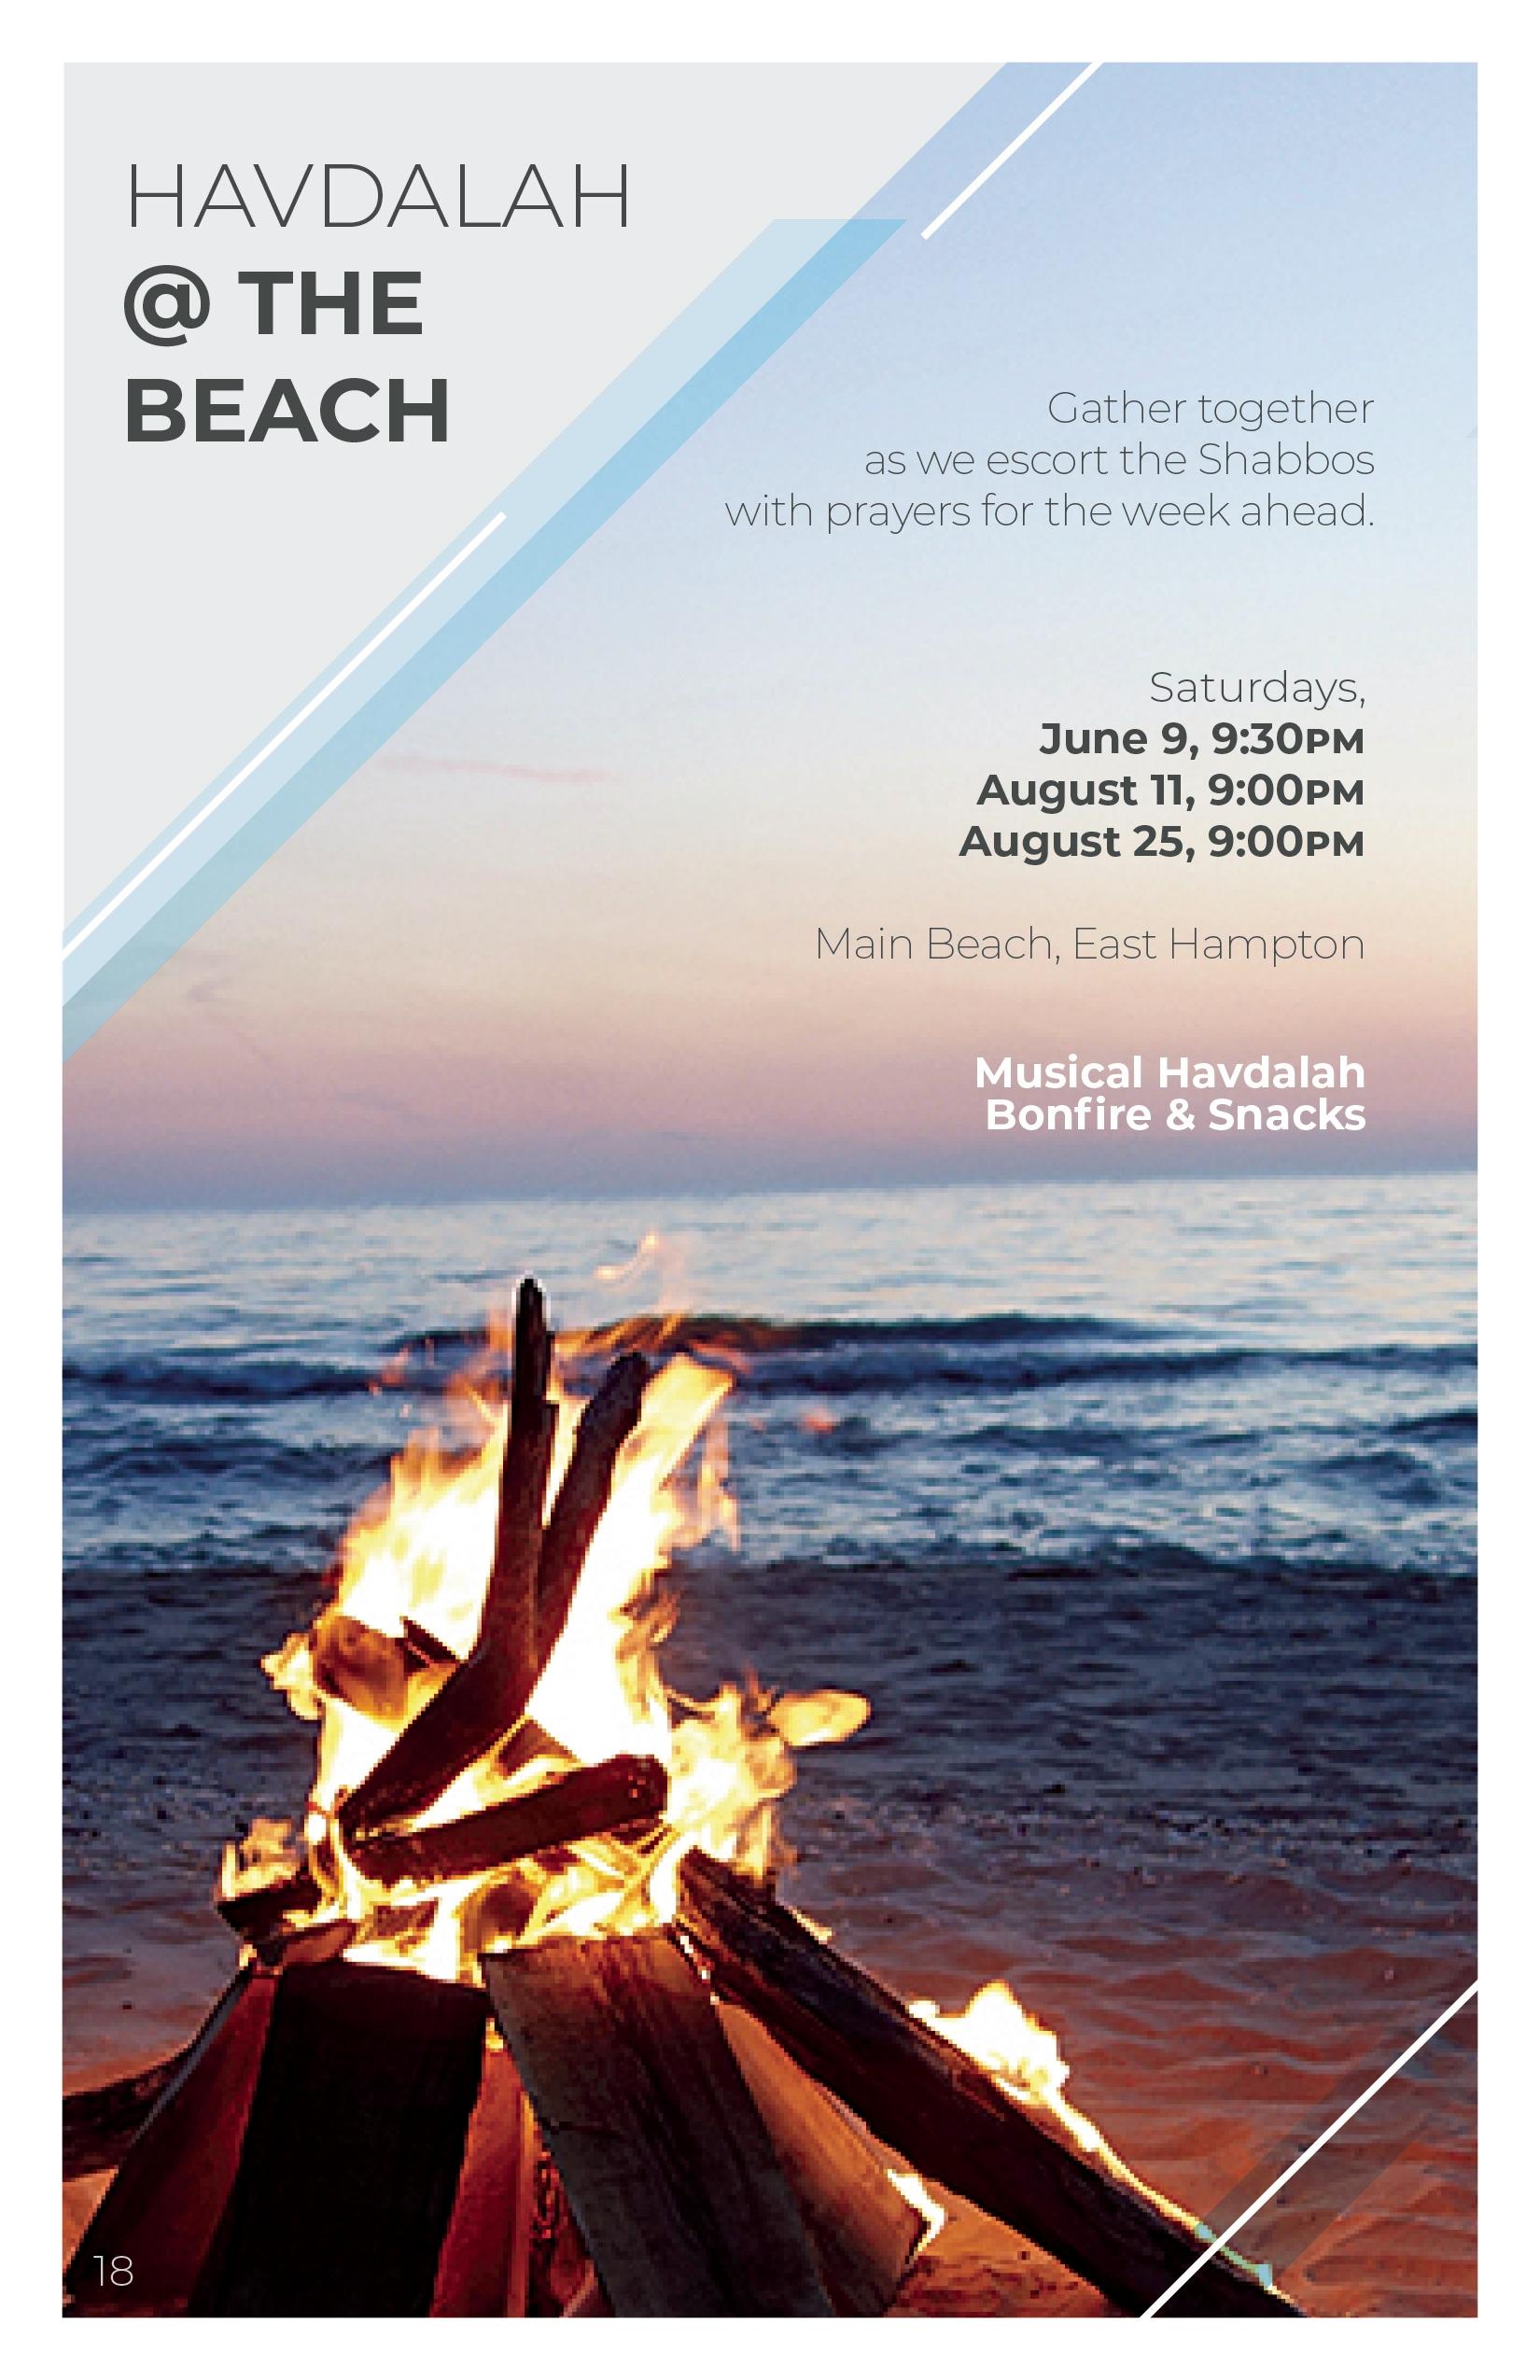 ProgramGuide summer5778 havdalahatthe beach.jpg